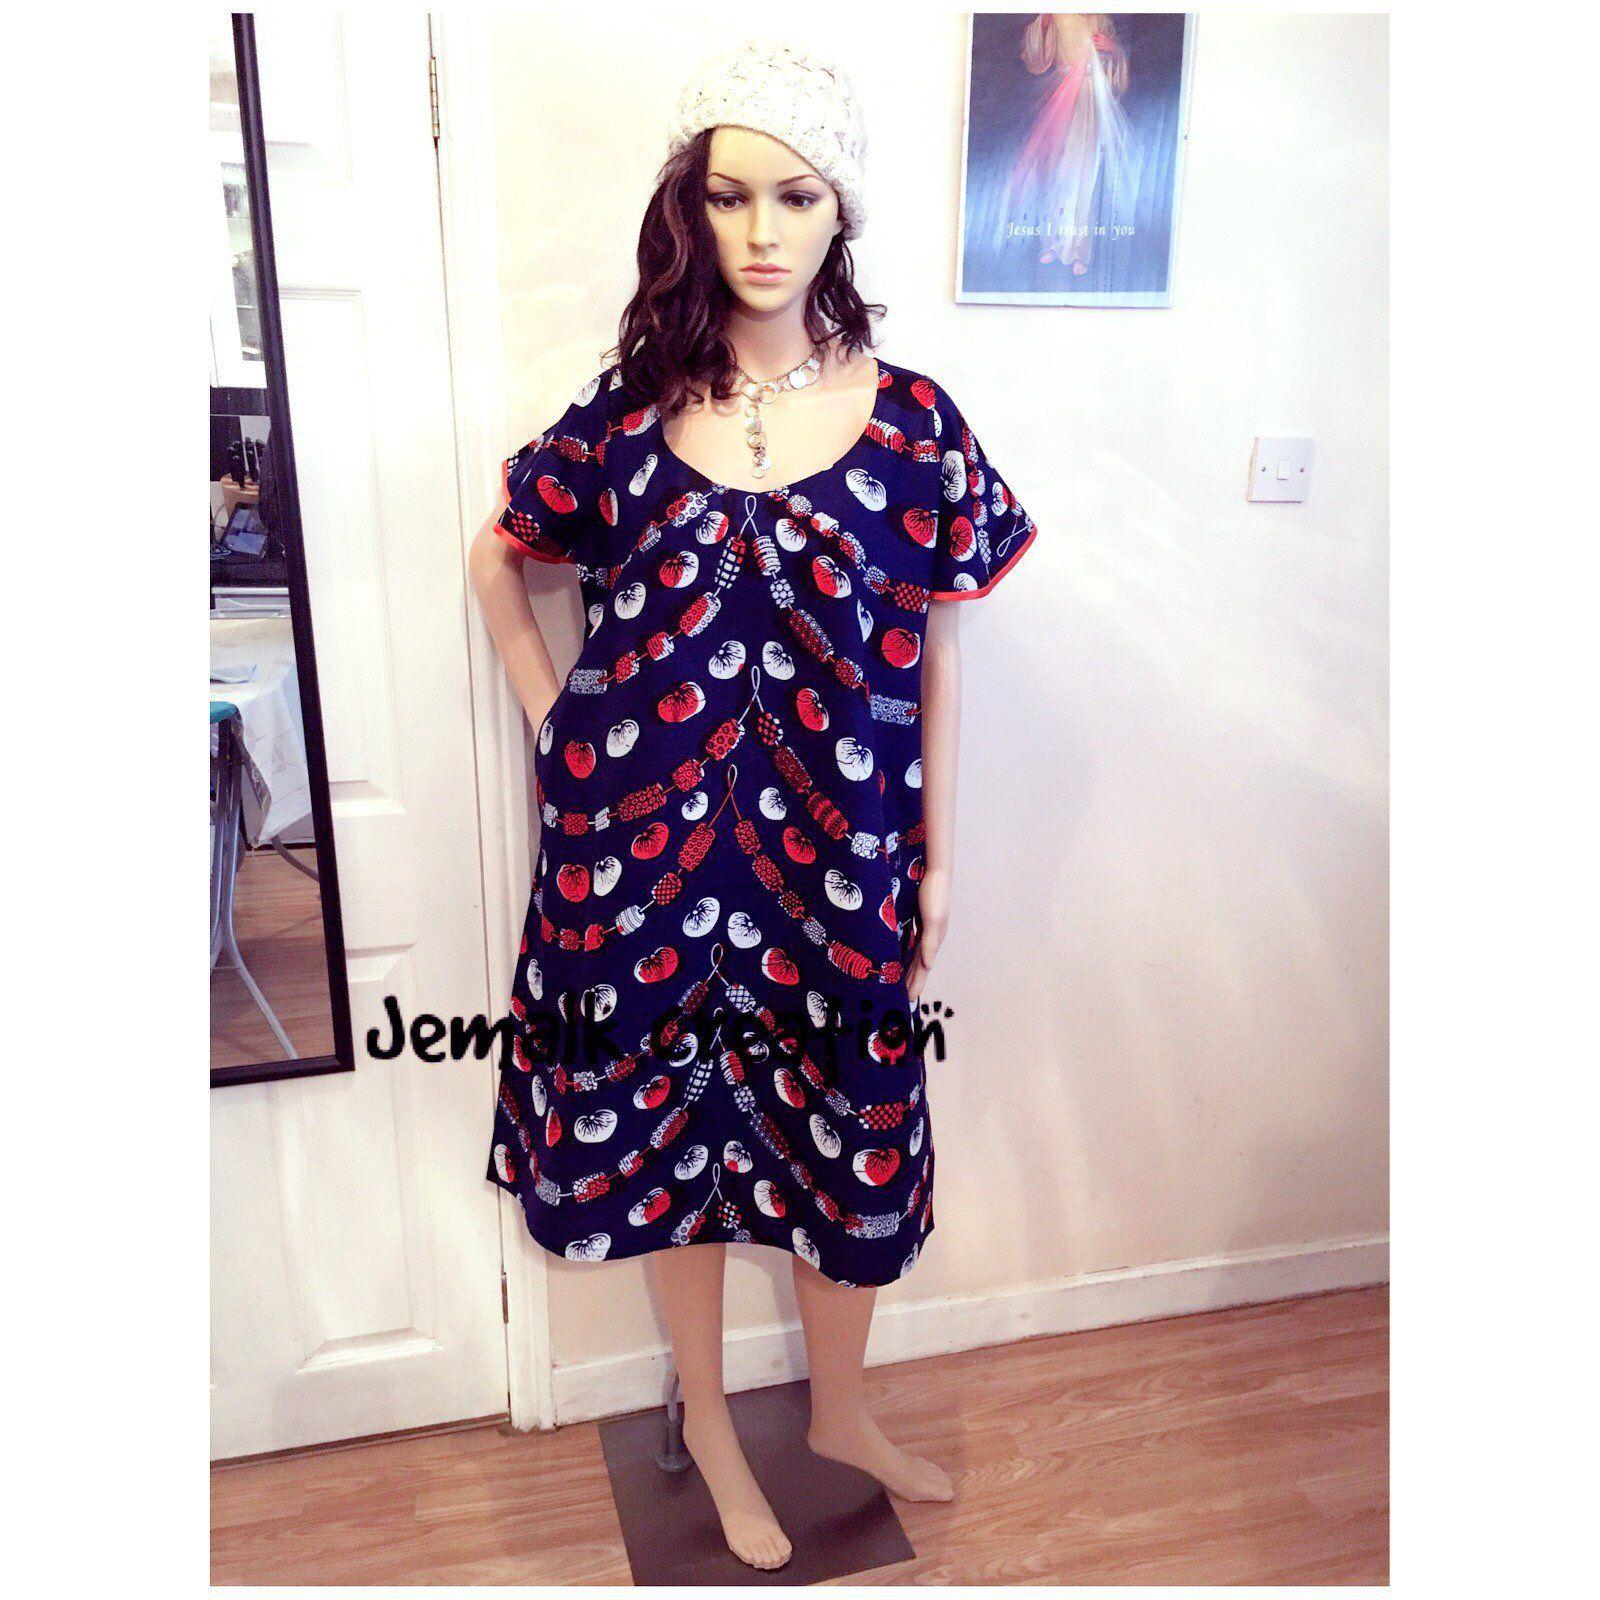 07deb4ab50a Womens Summer Dresses Size 16 - Data Dynamic AG